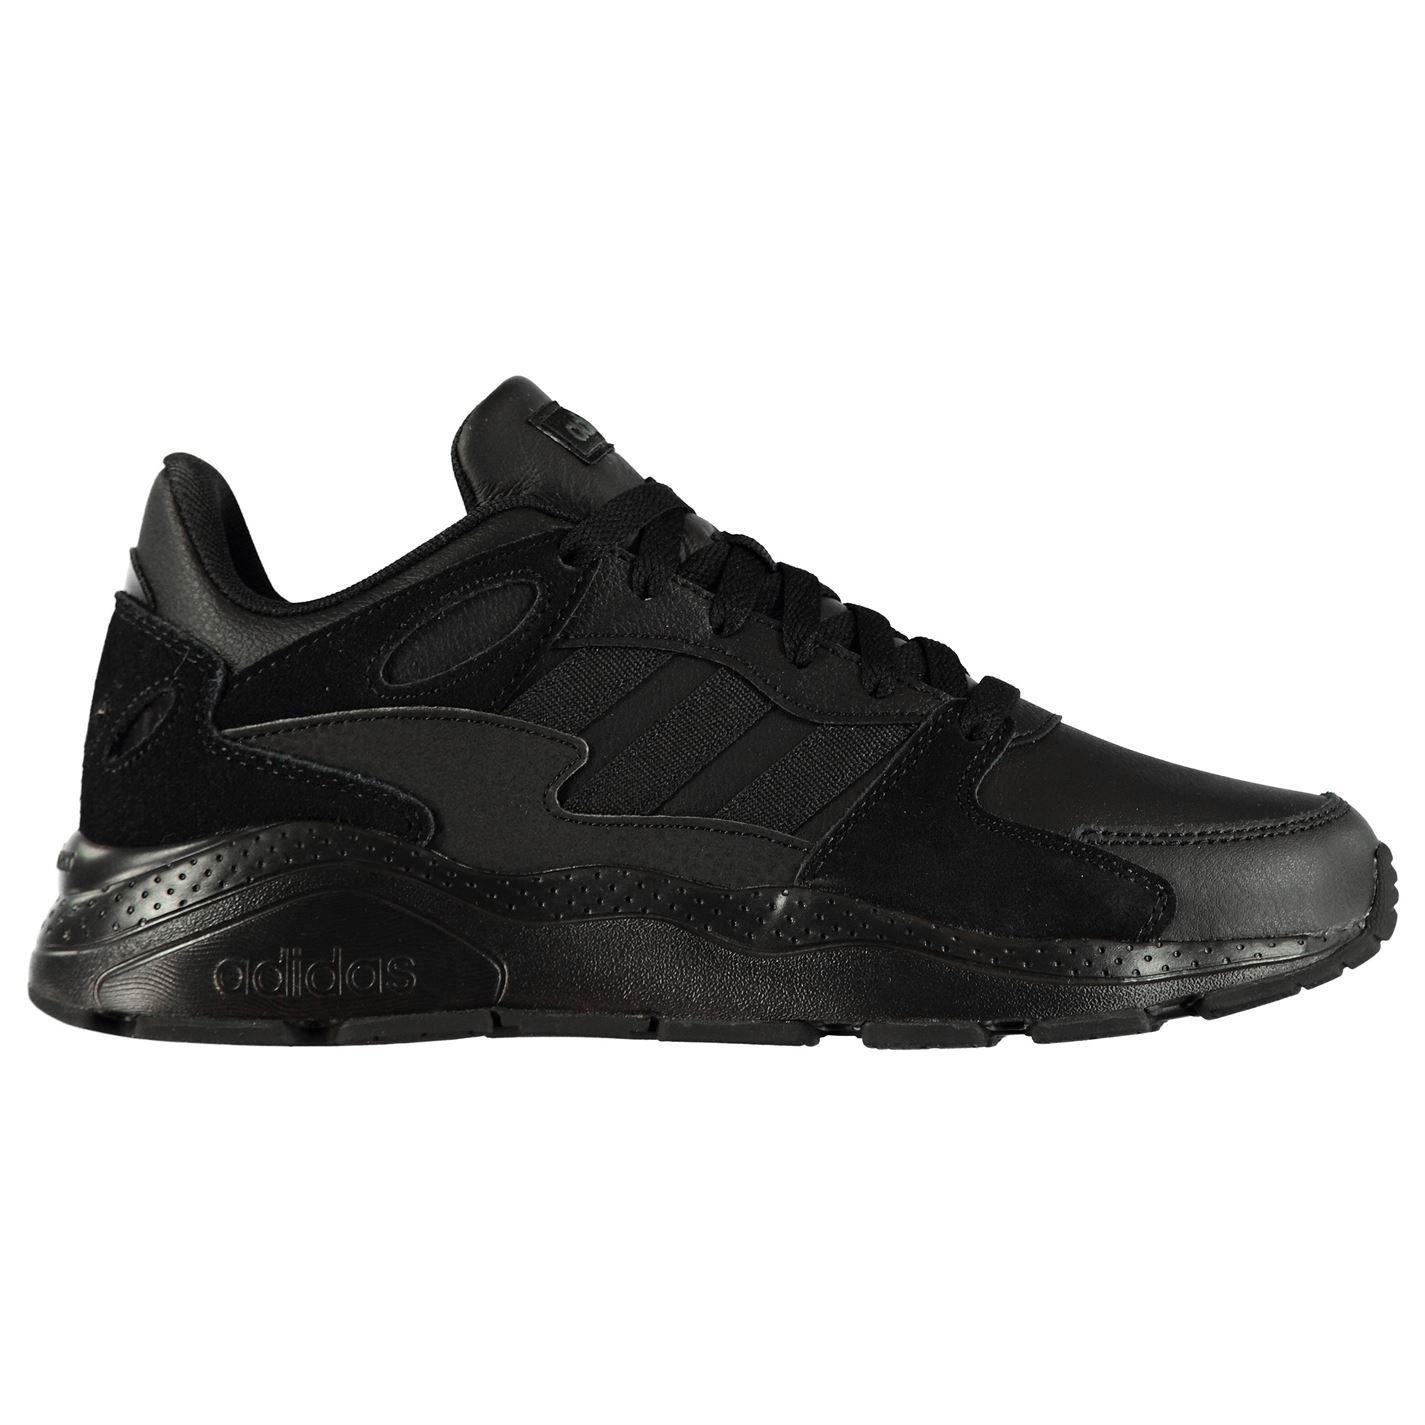 Adidas-Crazychaos-Baskets-Homme-Chaussures-De-Loisirs-Chaussures-Baskets miniature 5